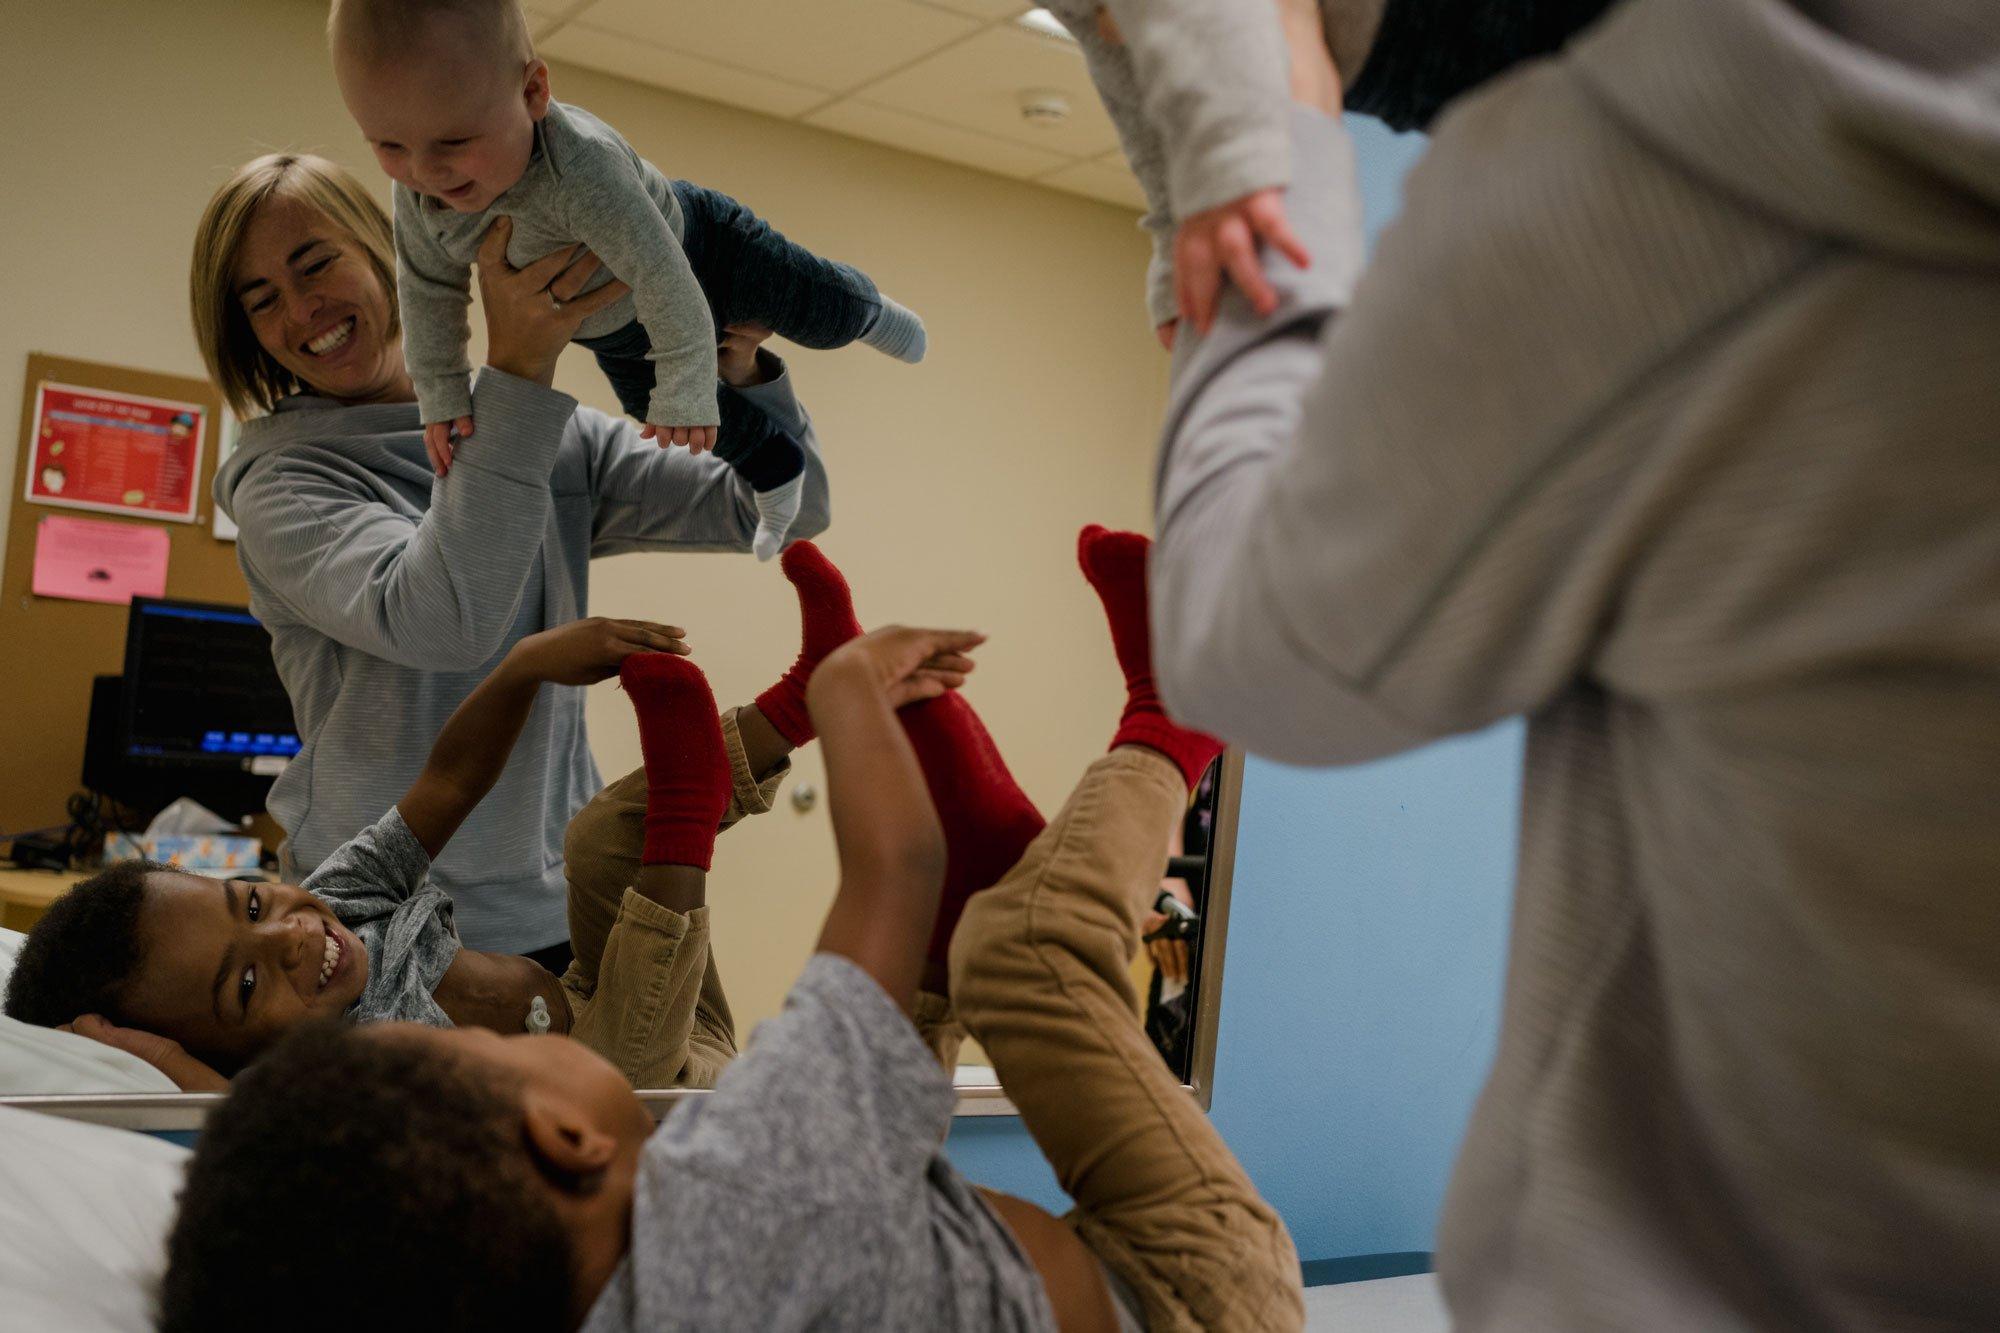 mom entertaining children at doctors